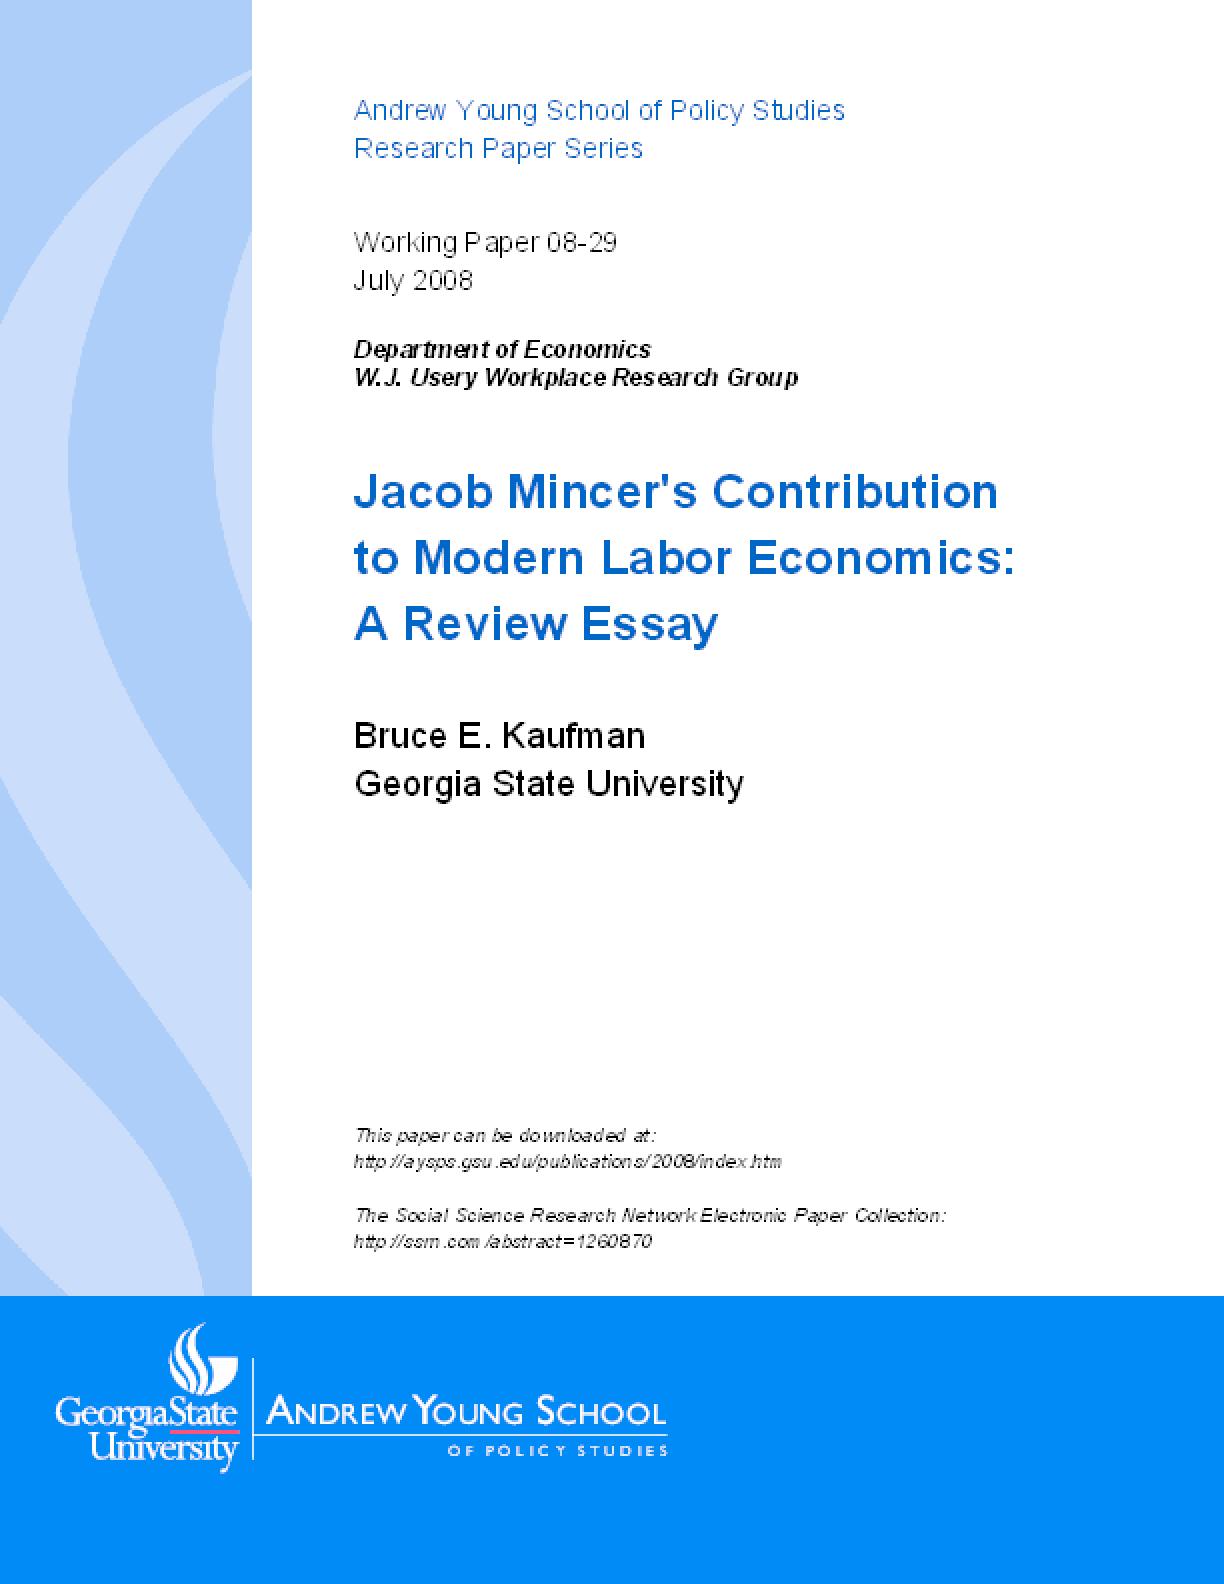 Jacob Mincer's Contribution to Modern Labor Economics: A Review Essay